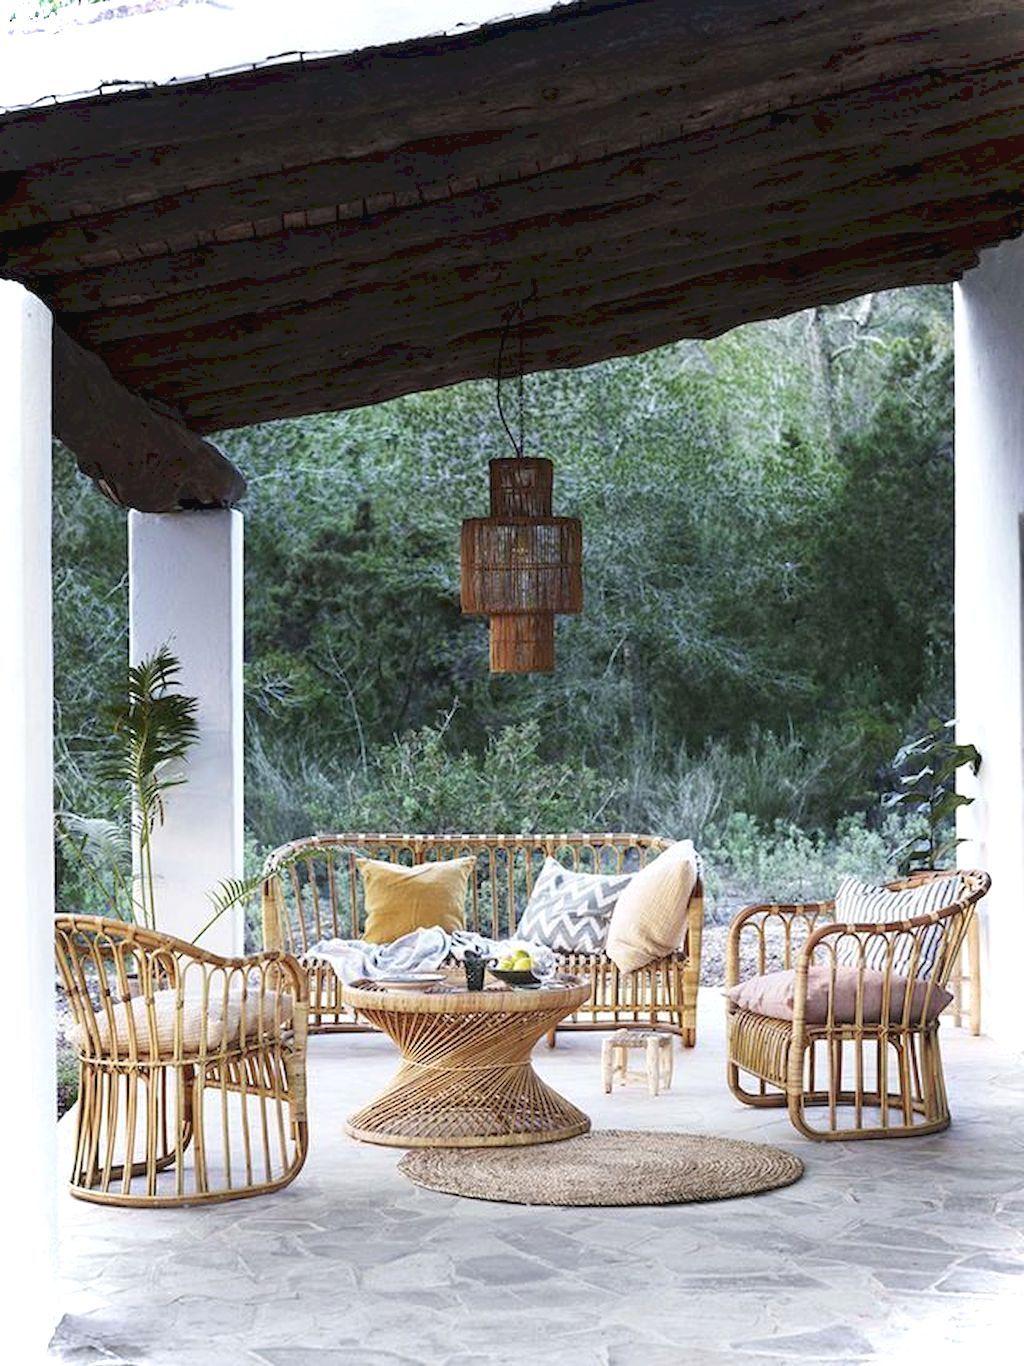 Cool 40 Vintage Garden Furniture Ideas For Outdoor Living Https Roomaholic Com 798 40 Vintage Garden Furniture Ideas Outd Outdoor Spaces Outdoor Living Patio